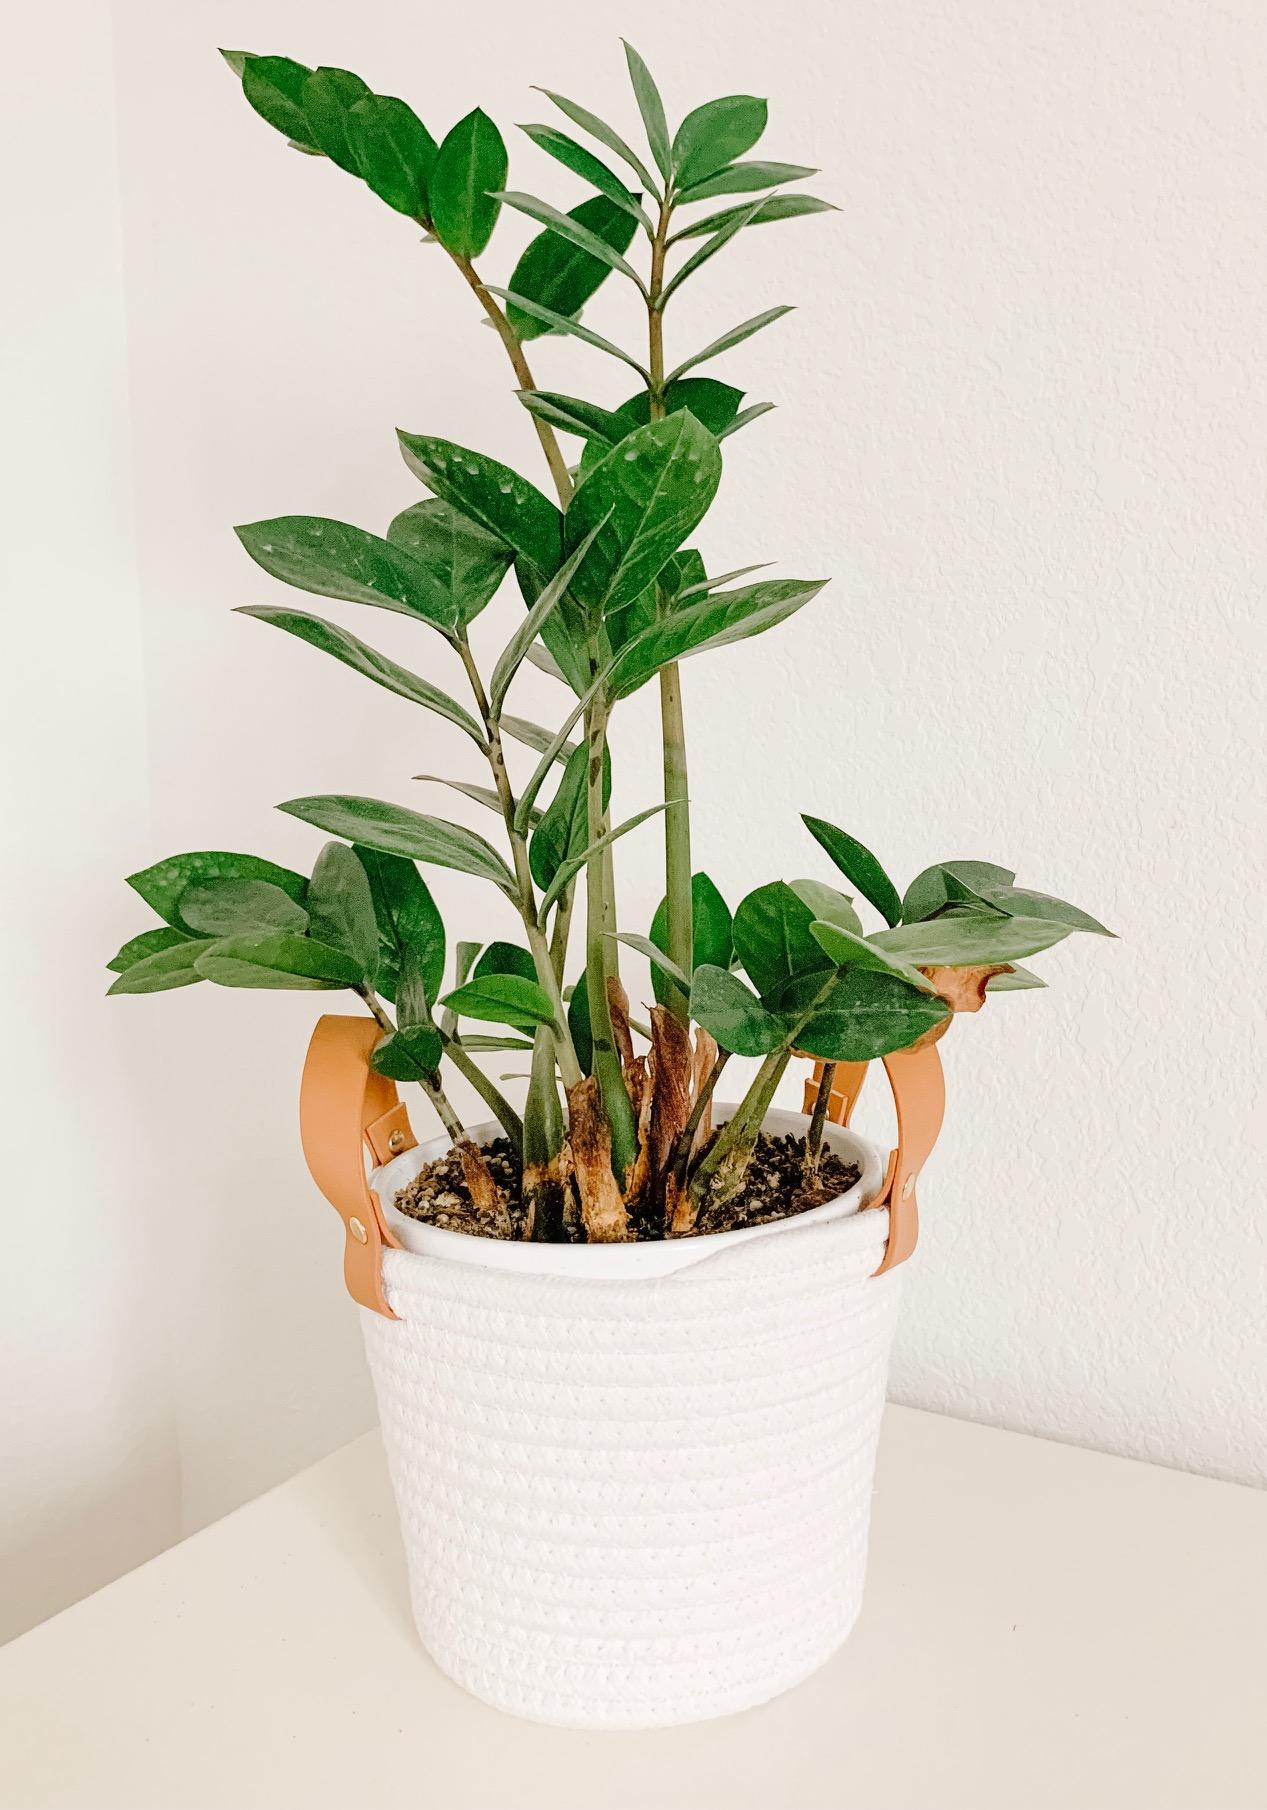 zz plant in a woven basket